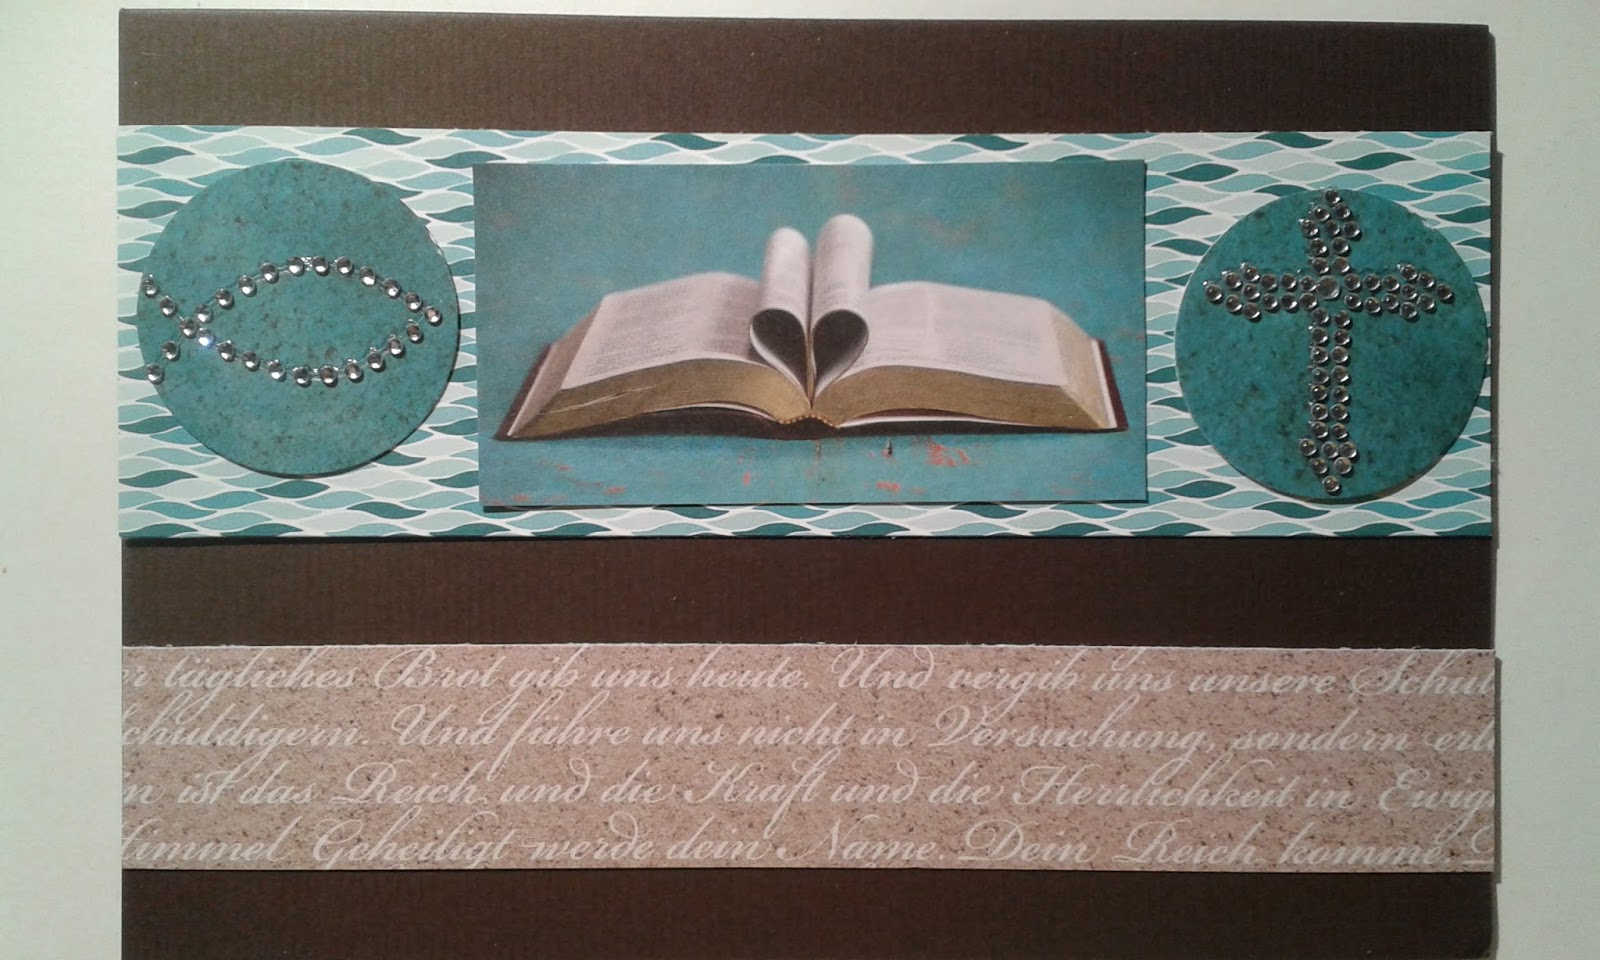 conny s kreative welt weitere konfirmationskarten zum selber machen. Black Bedroom Furniture Sets. Home Design Ideas